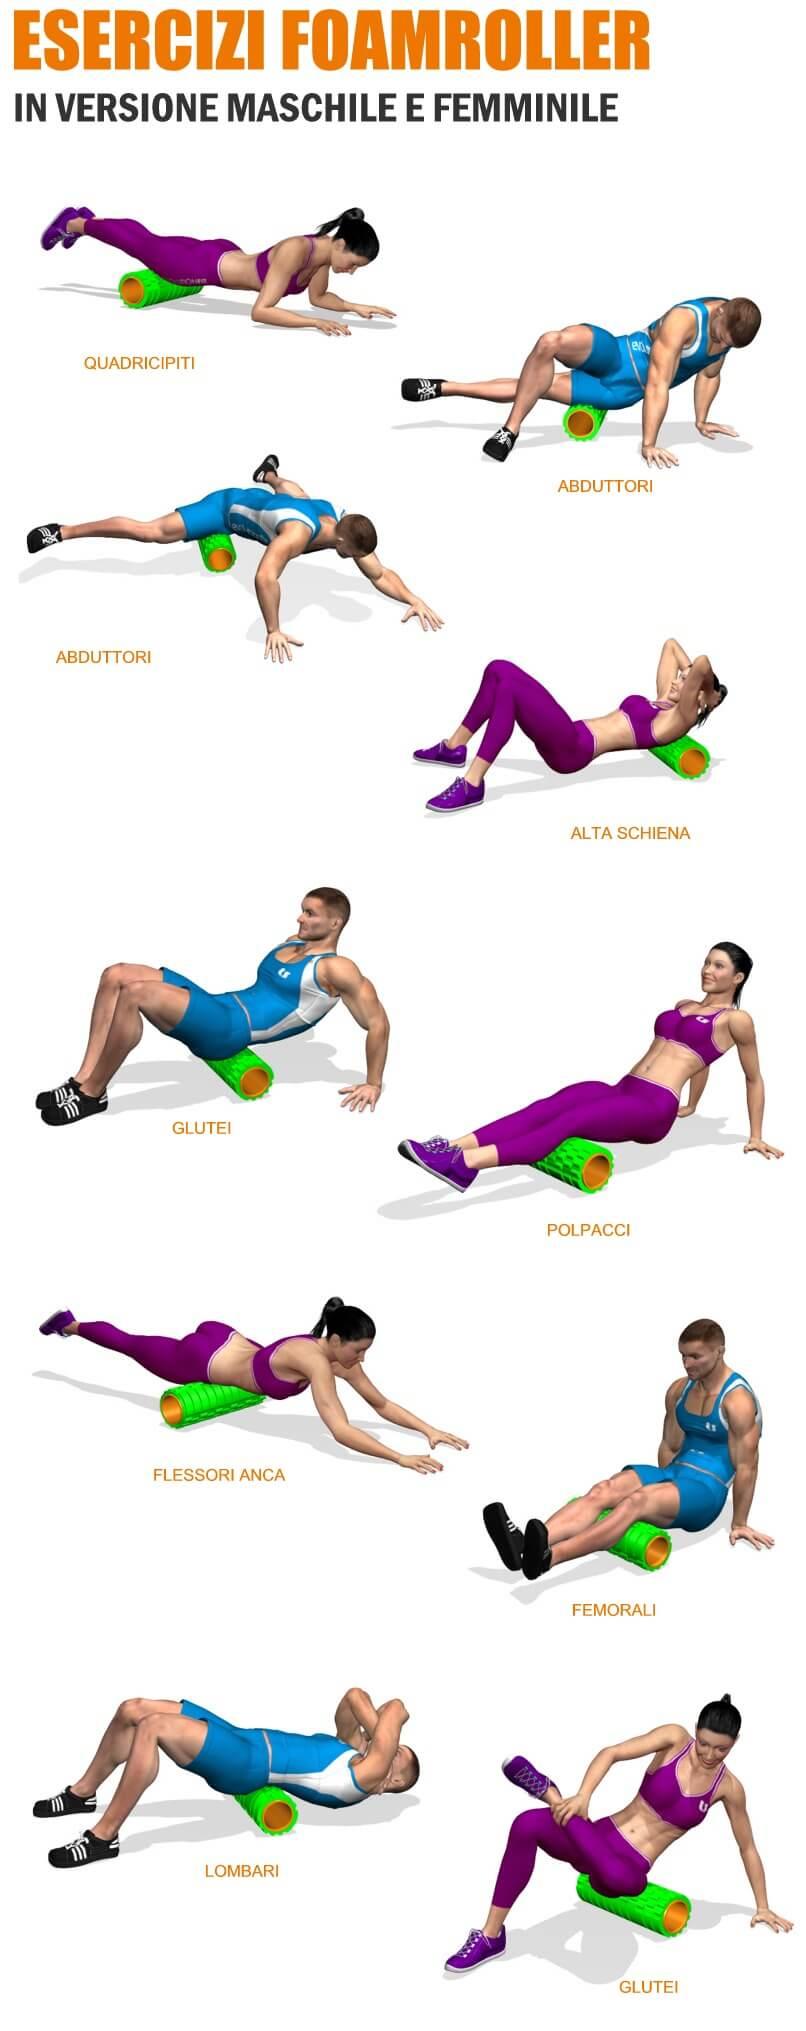 nuovi-esercizi-foamroller-evolutionfit